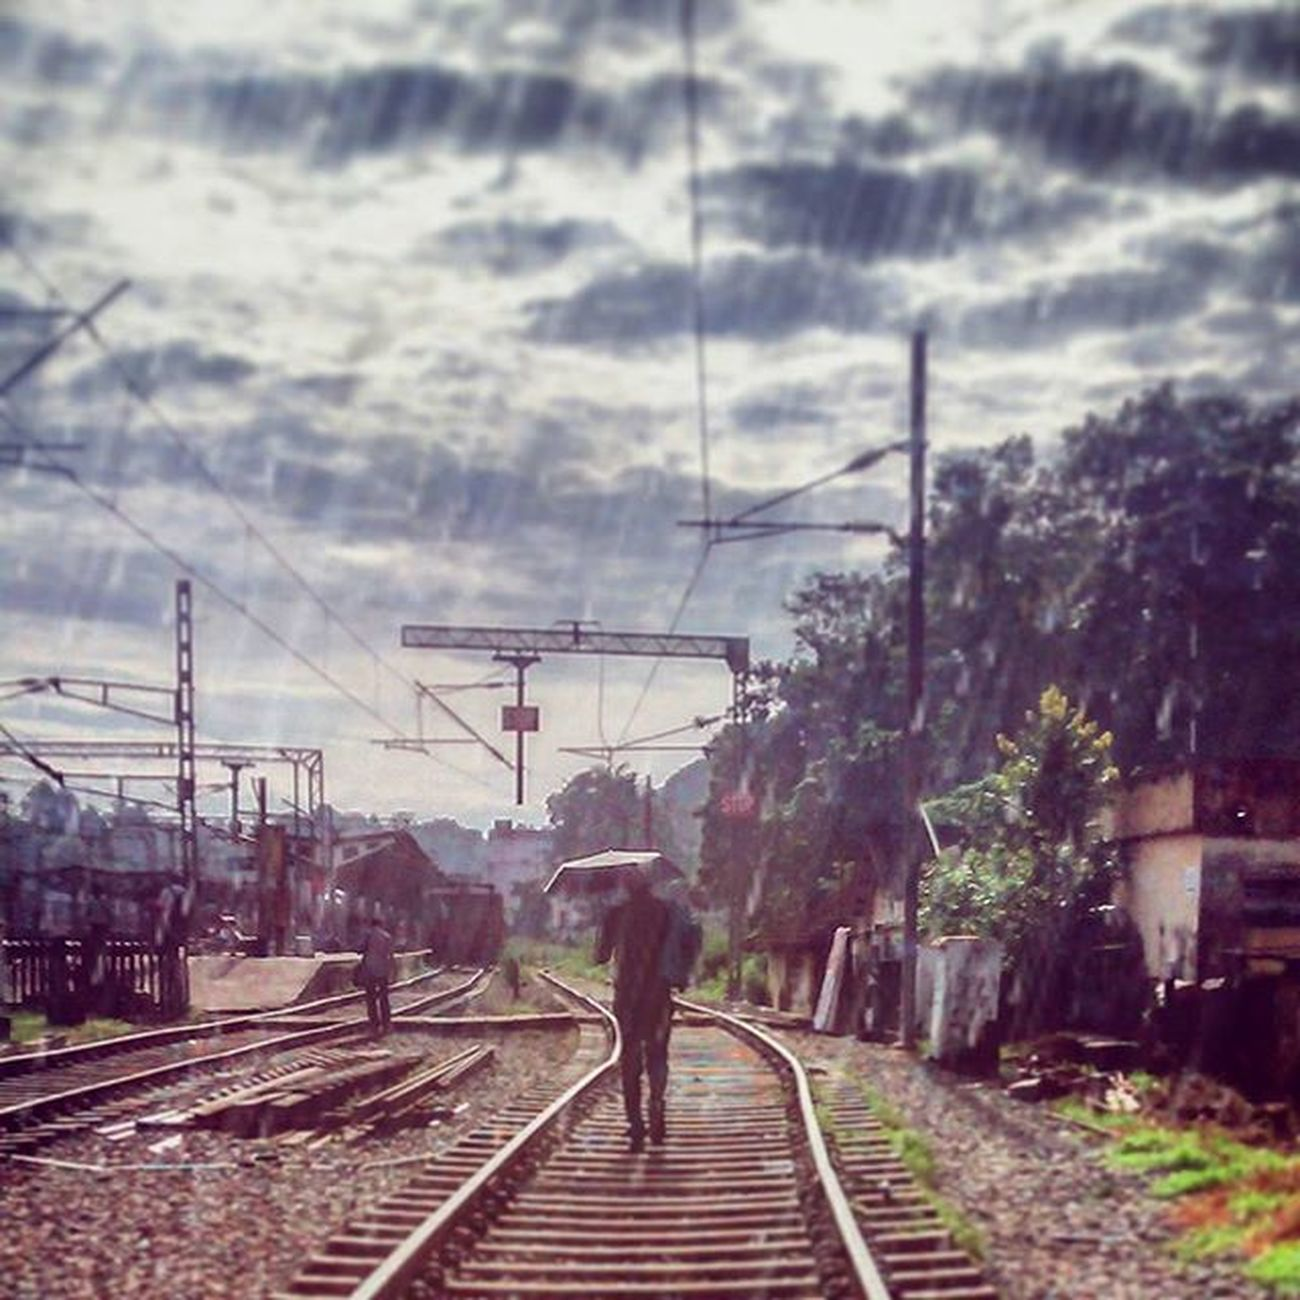 Walking Hazards™ 🙅👷👮👽👣 Travel Travelogue Manontrack Spotclick Tiltnshift Kottayam Offtokochin Morning Rain Love Strangeronframe Insta Instamood Instalike Instadaily F2f L4l Followforfollow Follow Followmefollowyou Peace